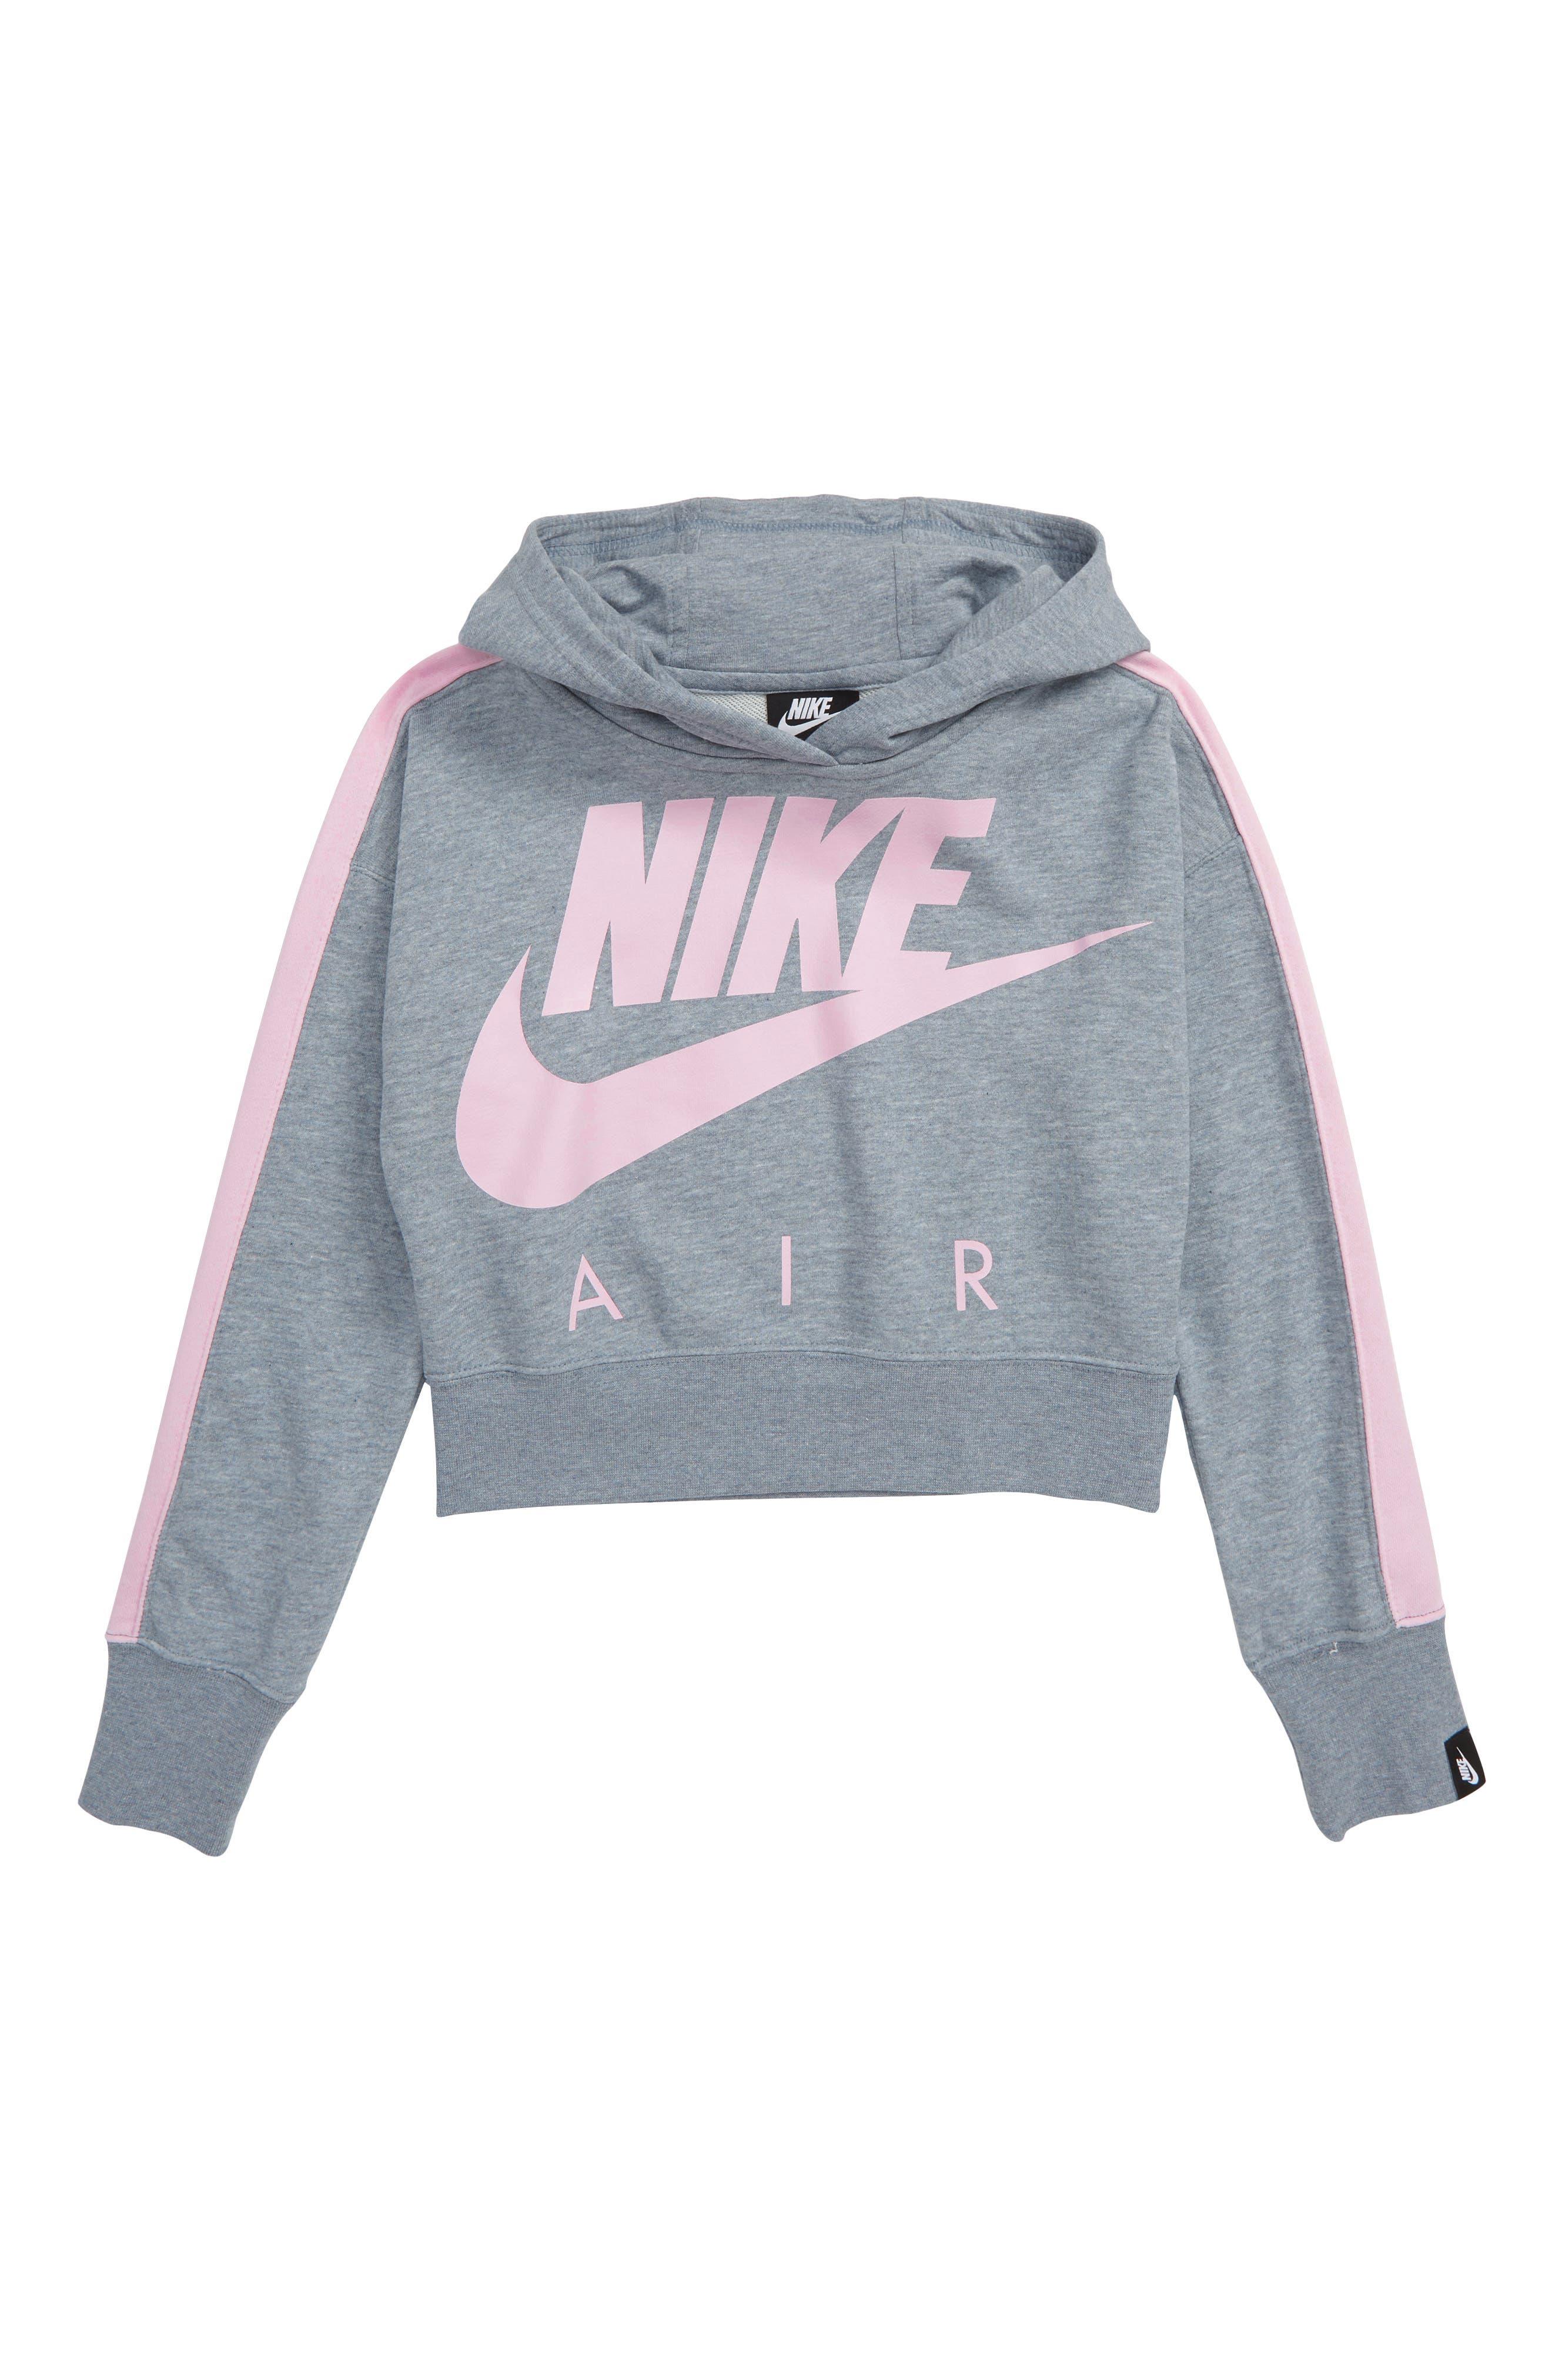 NIKE, Air Logo Crop Sweatshirt, Main thumbnail 1, color, ASHEN SLATE/ HEATHER/ PINK